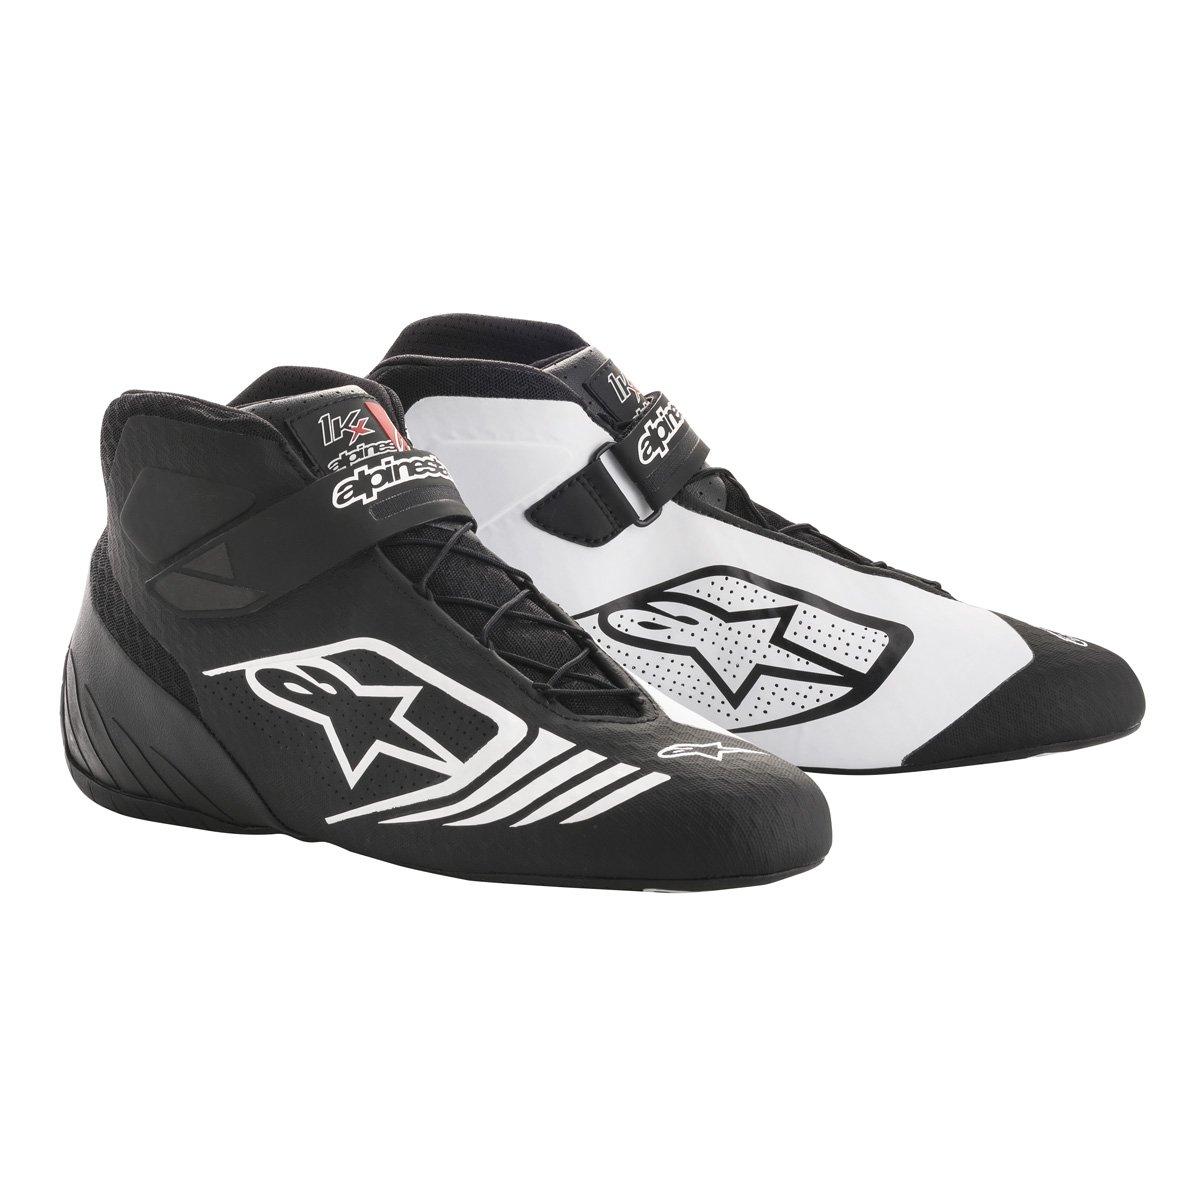 Size 8.5 Black//Red//White Alpinestars 2712118-132-8.5 Tech 1-KX Shoes